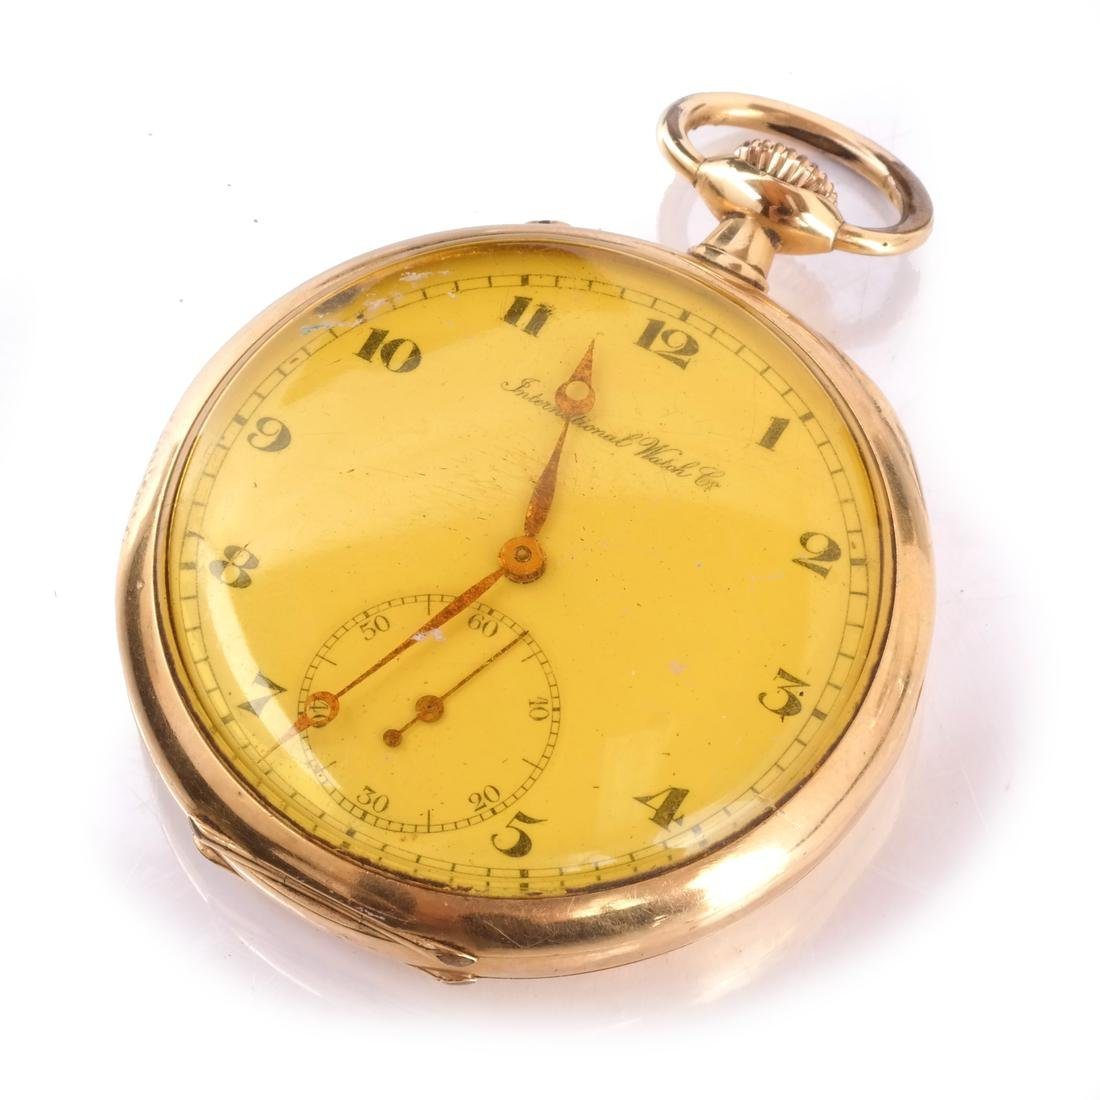 18k International Pocket Watch